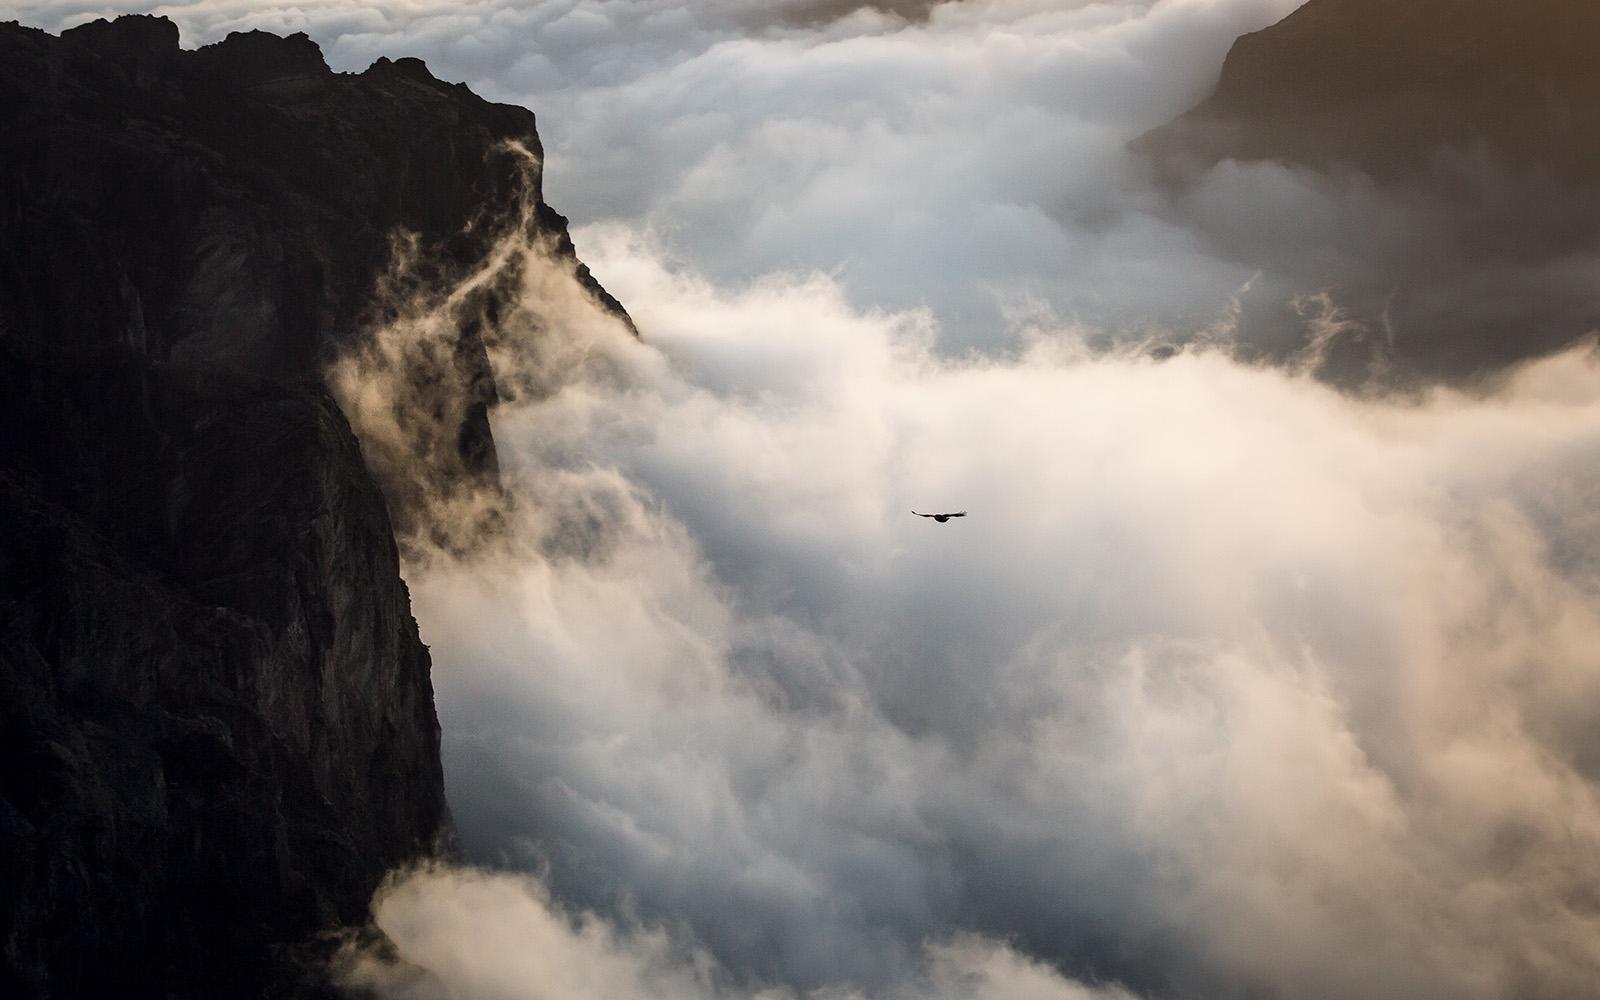 madere-madeira-island-portugal-voyage-travel-elise-julliard-photographe-photographer-pico-ruivo-arieiro-montagne-mountain-funchal-paysage-landscape-oiseau-bird